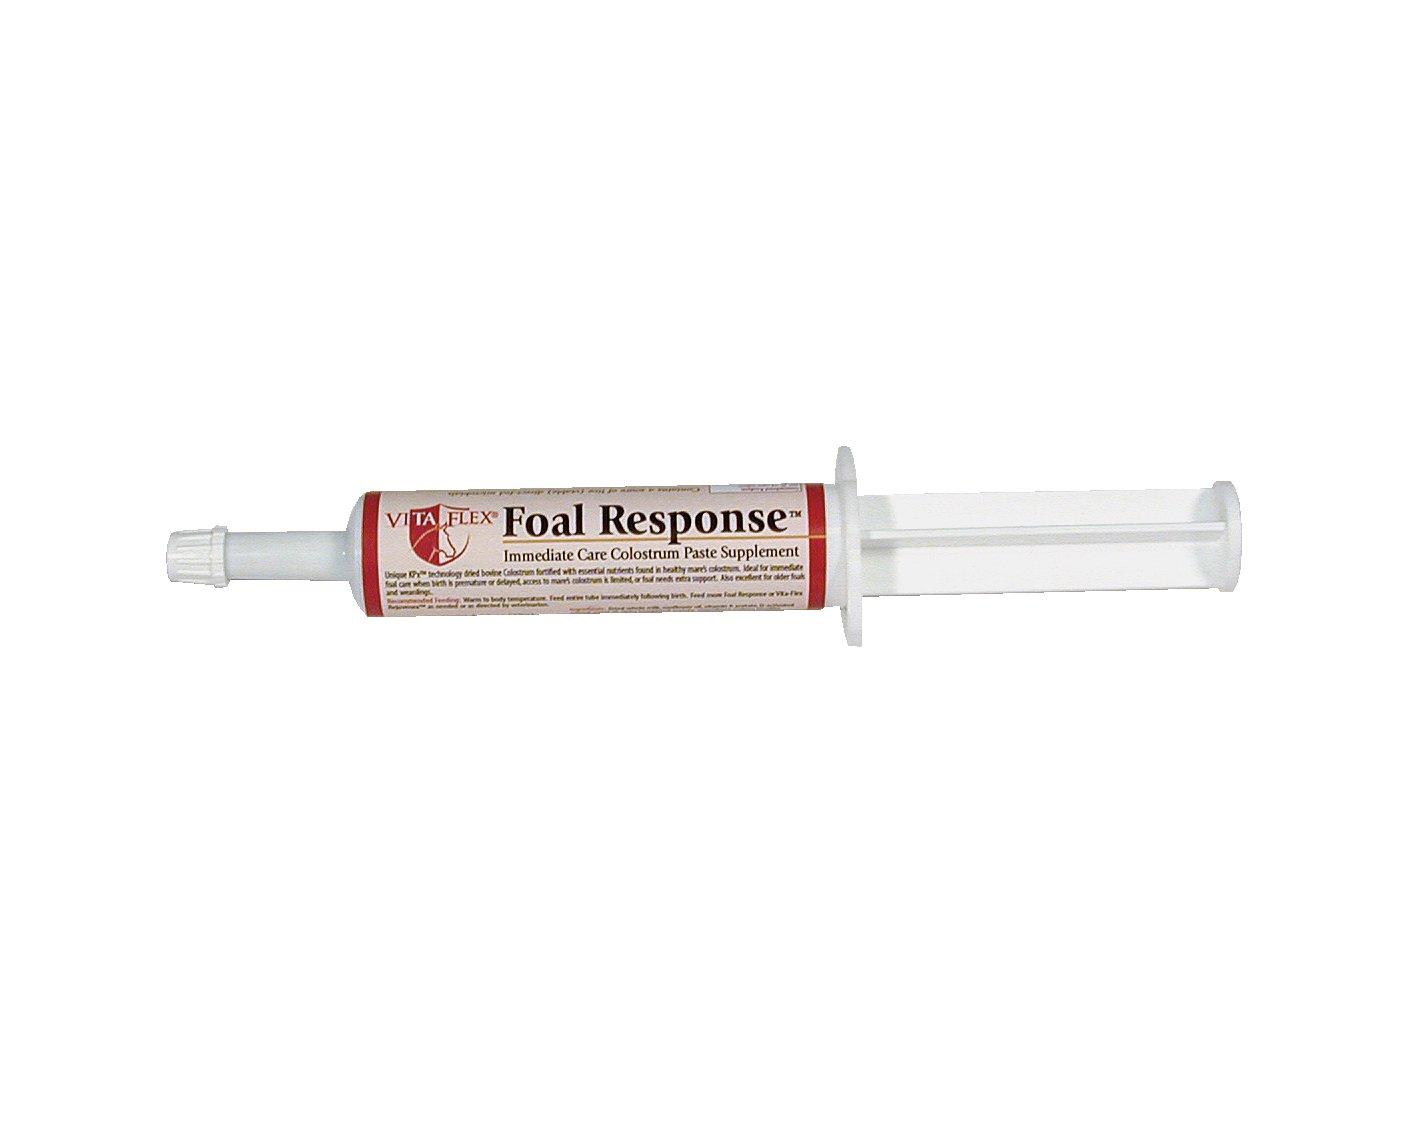 Vita Flex Foal Response Immediate Care Colostrum Paste Supplement, 1.05 oz